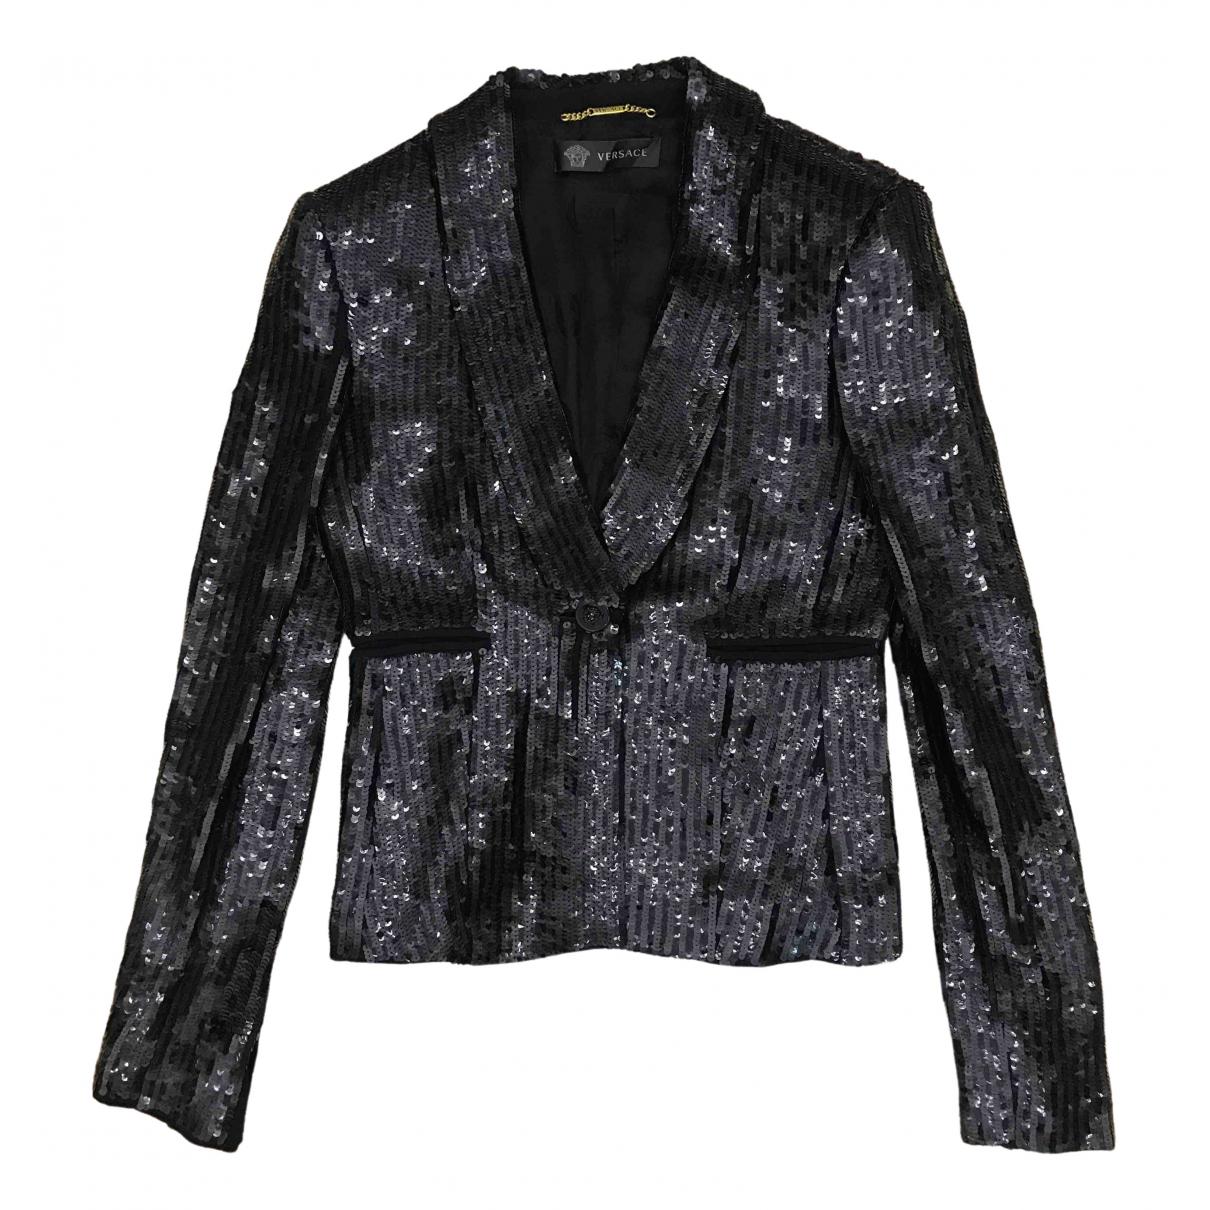 Versace \N Black Cotton jacket for Women 38 IT